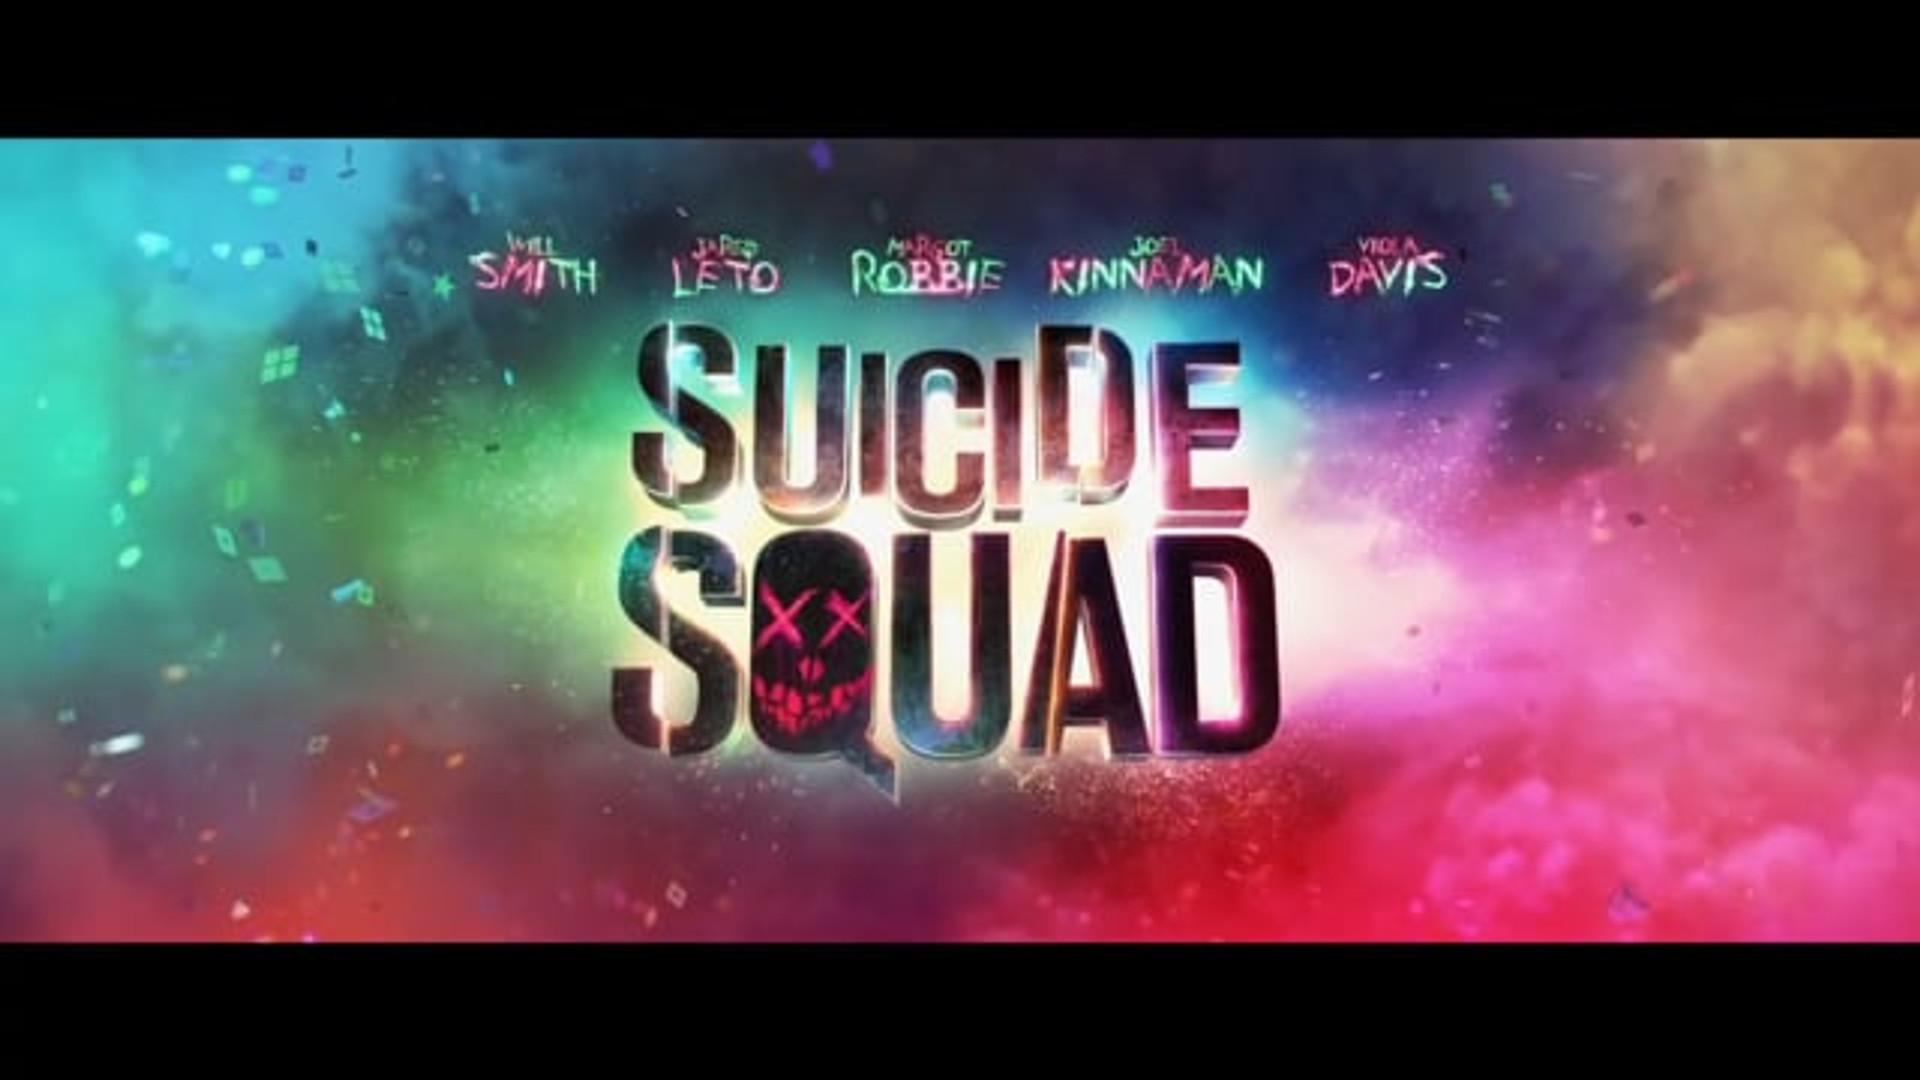 Suicide Squad Marketing